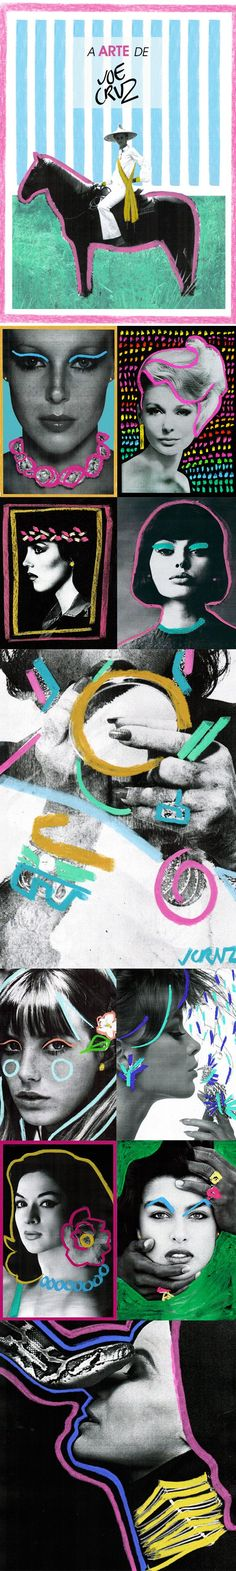 Achados da Bia | Arte | Joe Cruz: